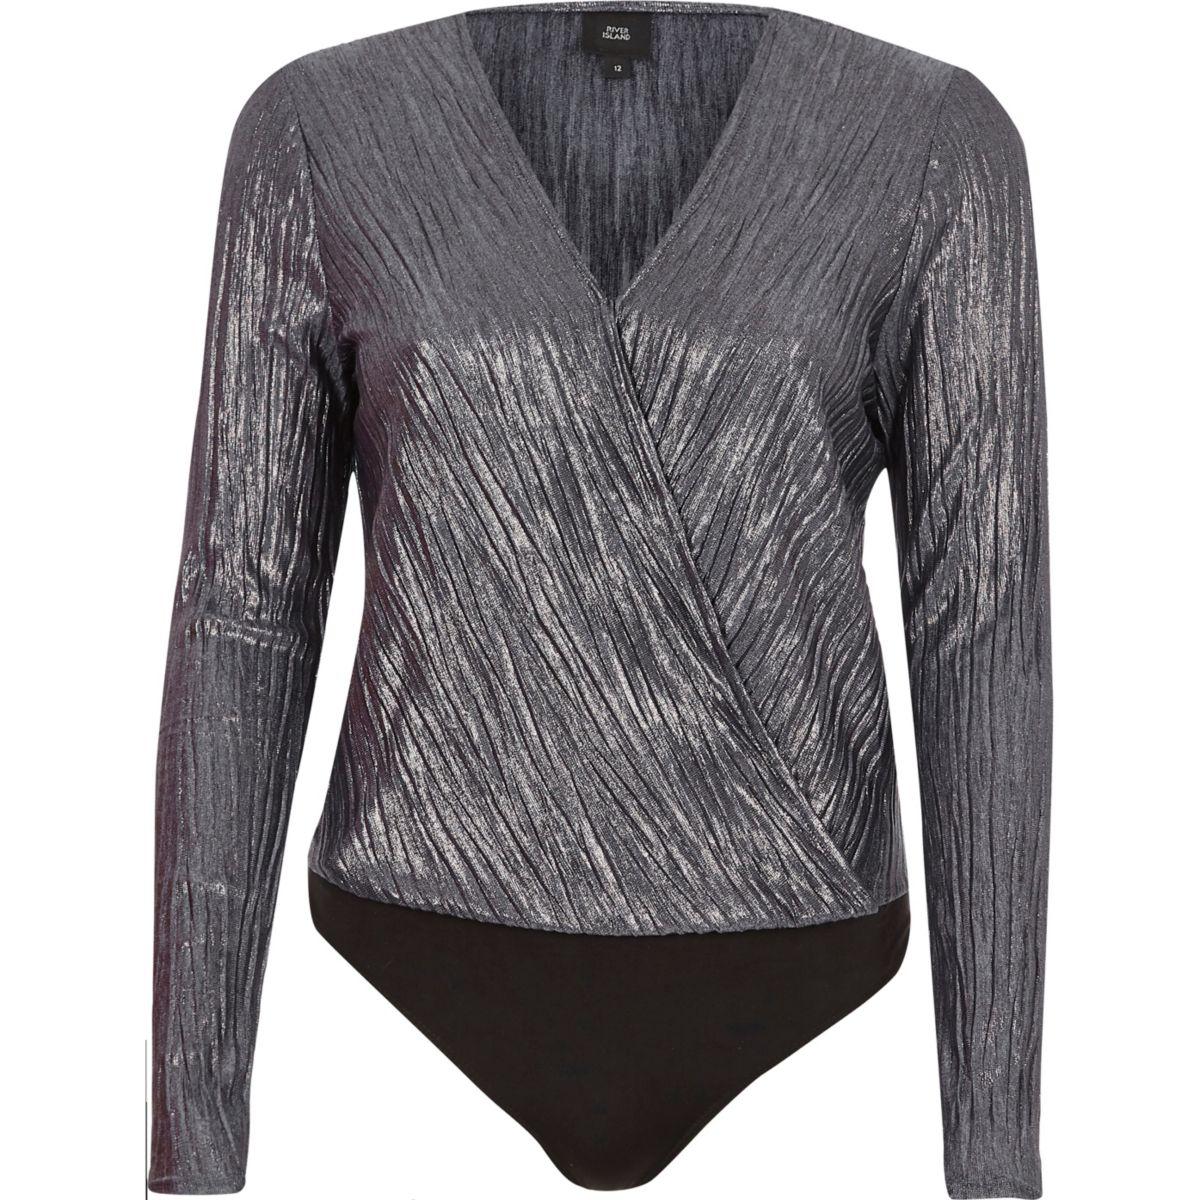 Silver metallic plisse wrap bodysuit